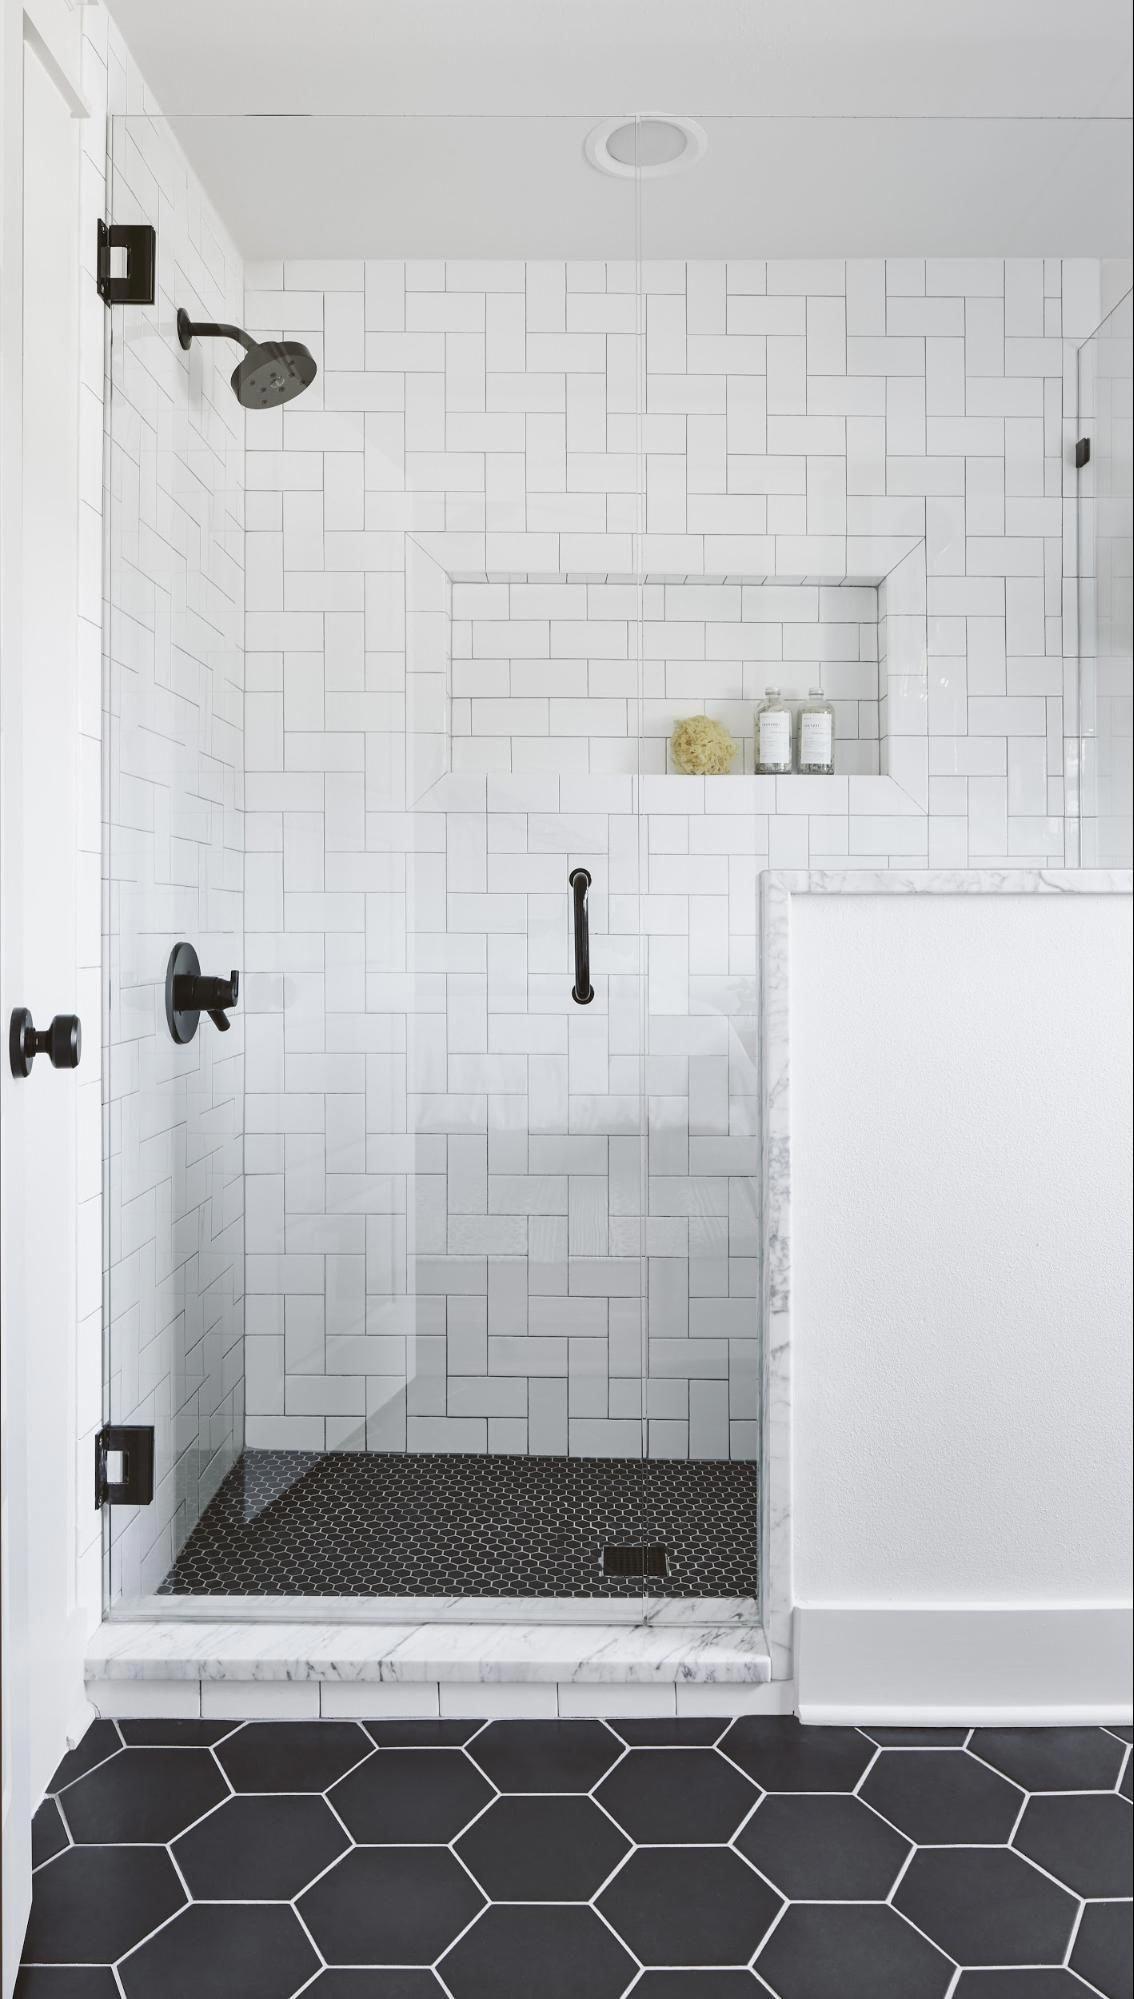 170 subway tile bathrooms ideas tile